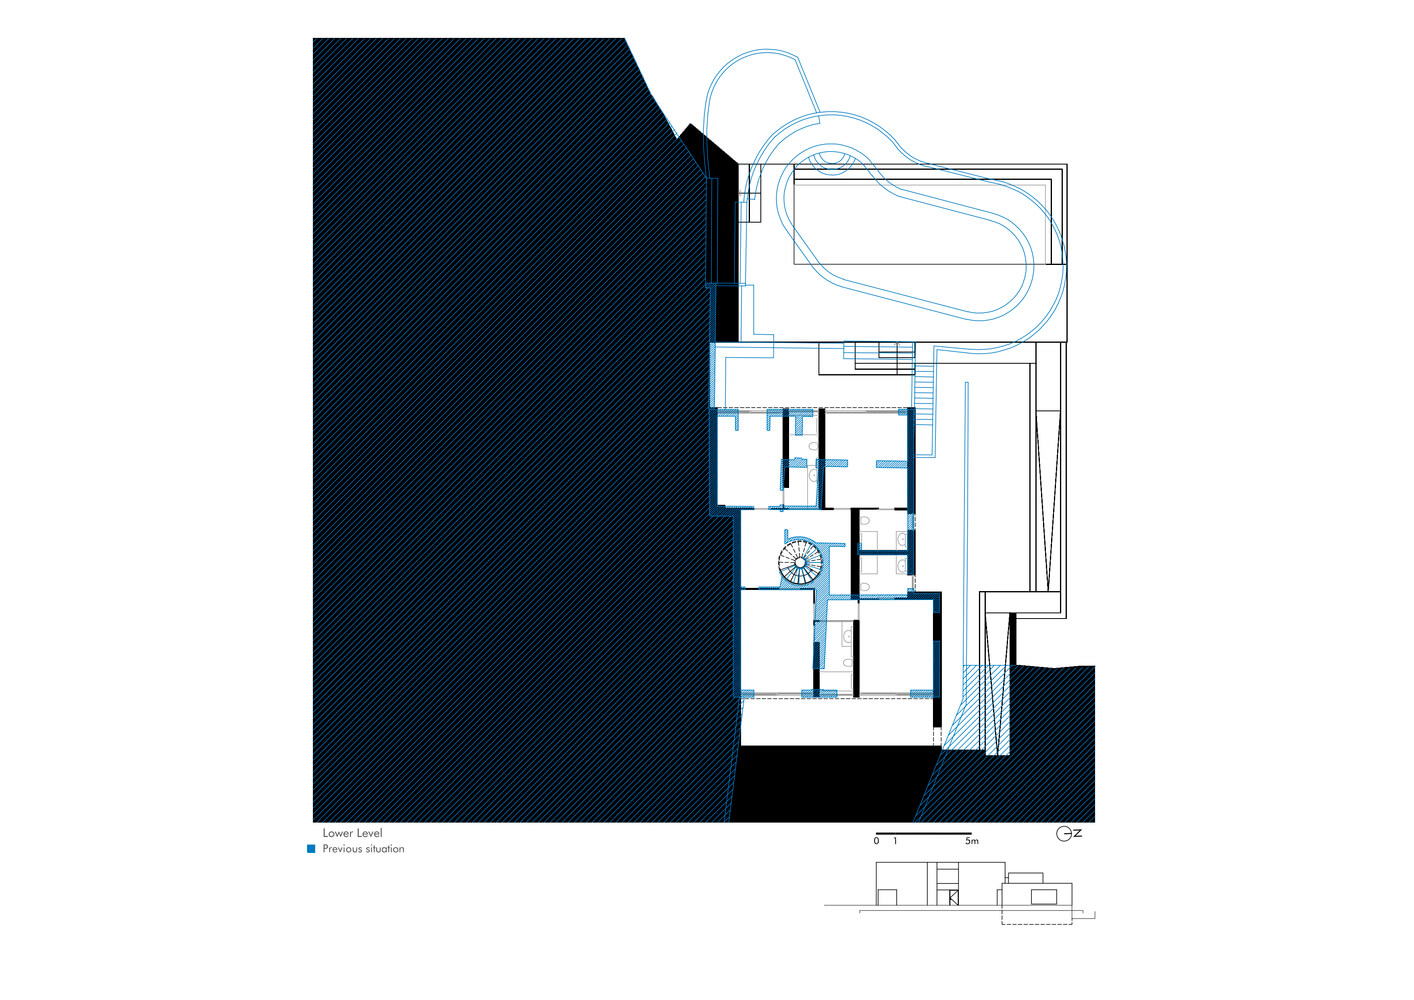 2 lower level